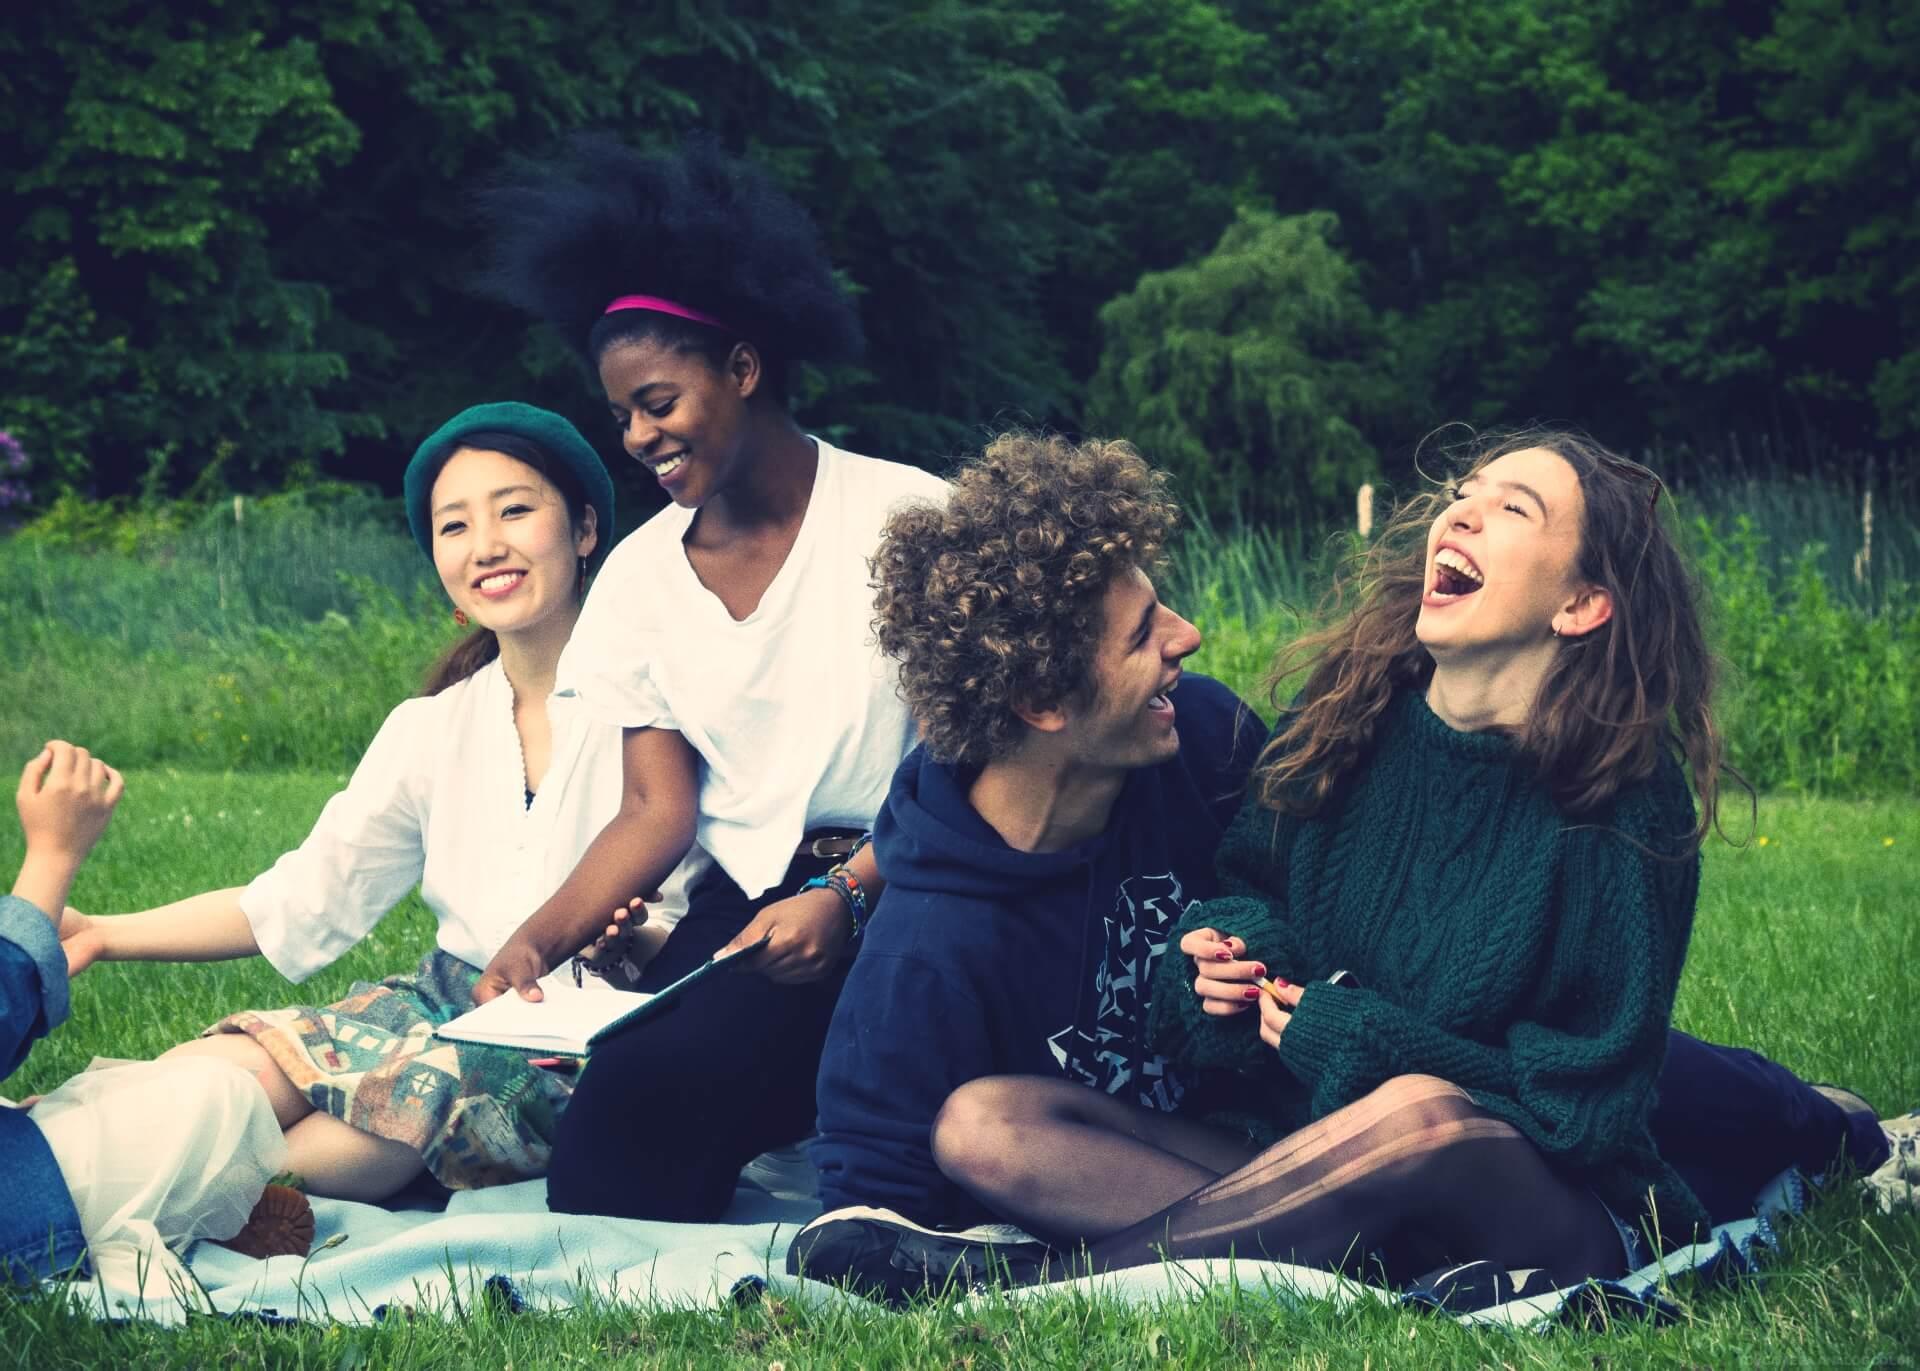 Folk High School Students hanging out - International People's College - a Folk High School in Denmark